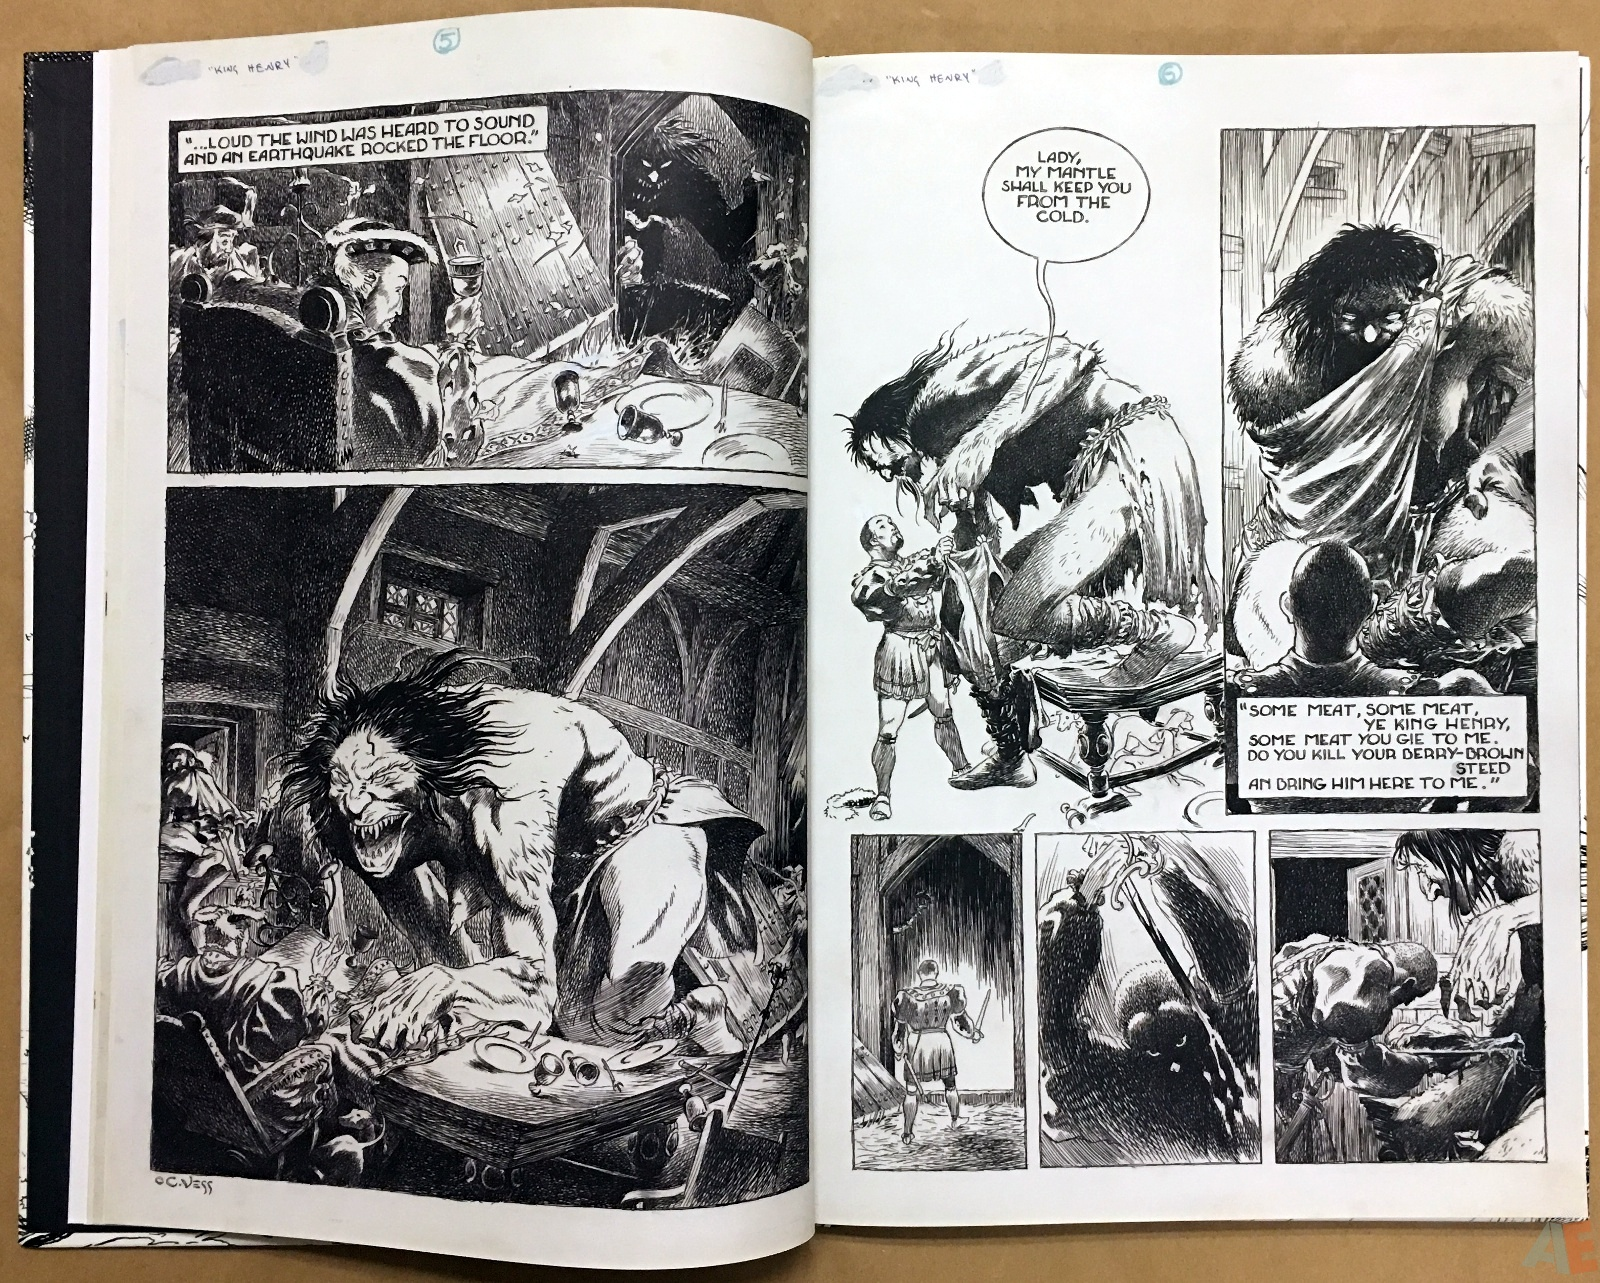 The Book Of Ballads, The Original Art Edition 14